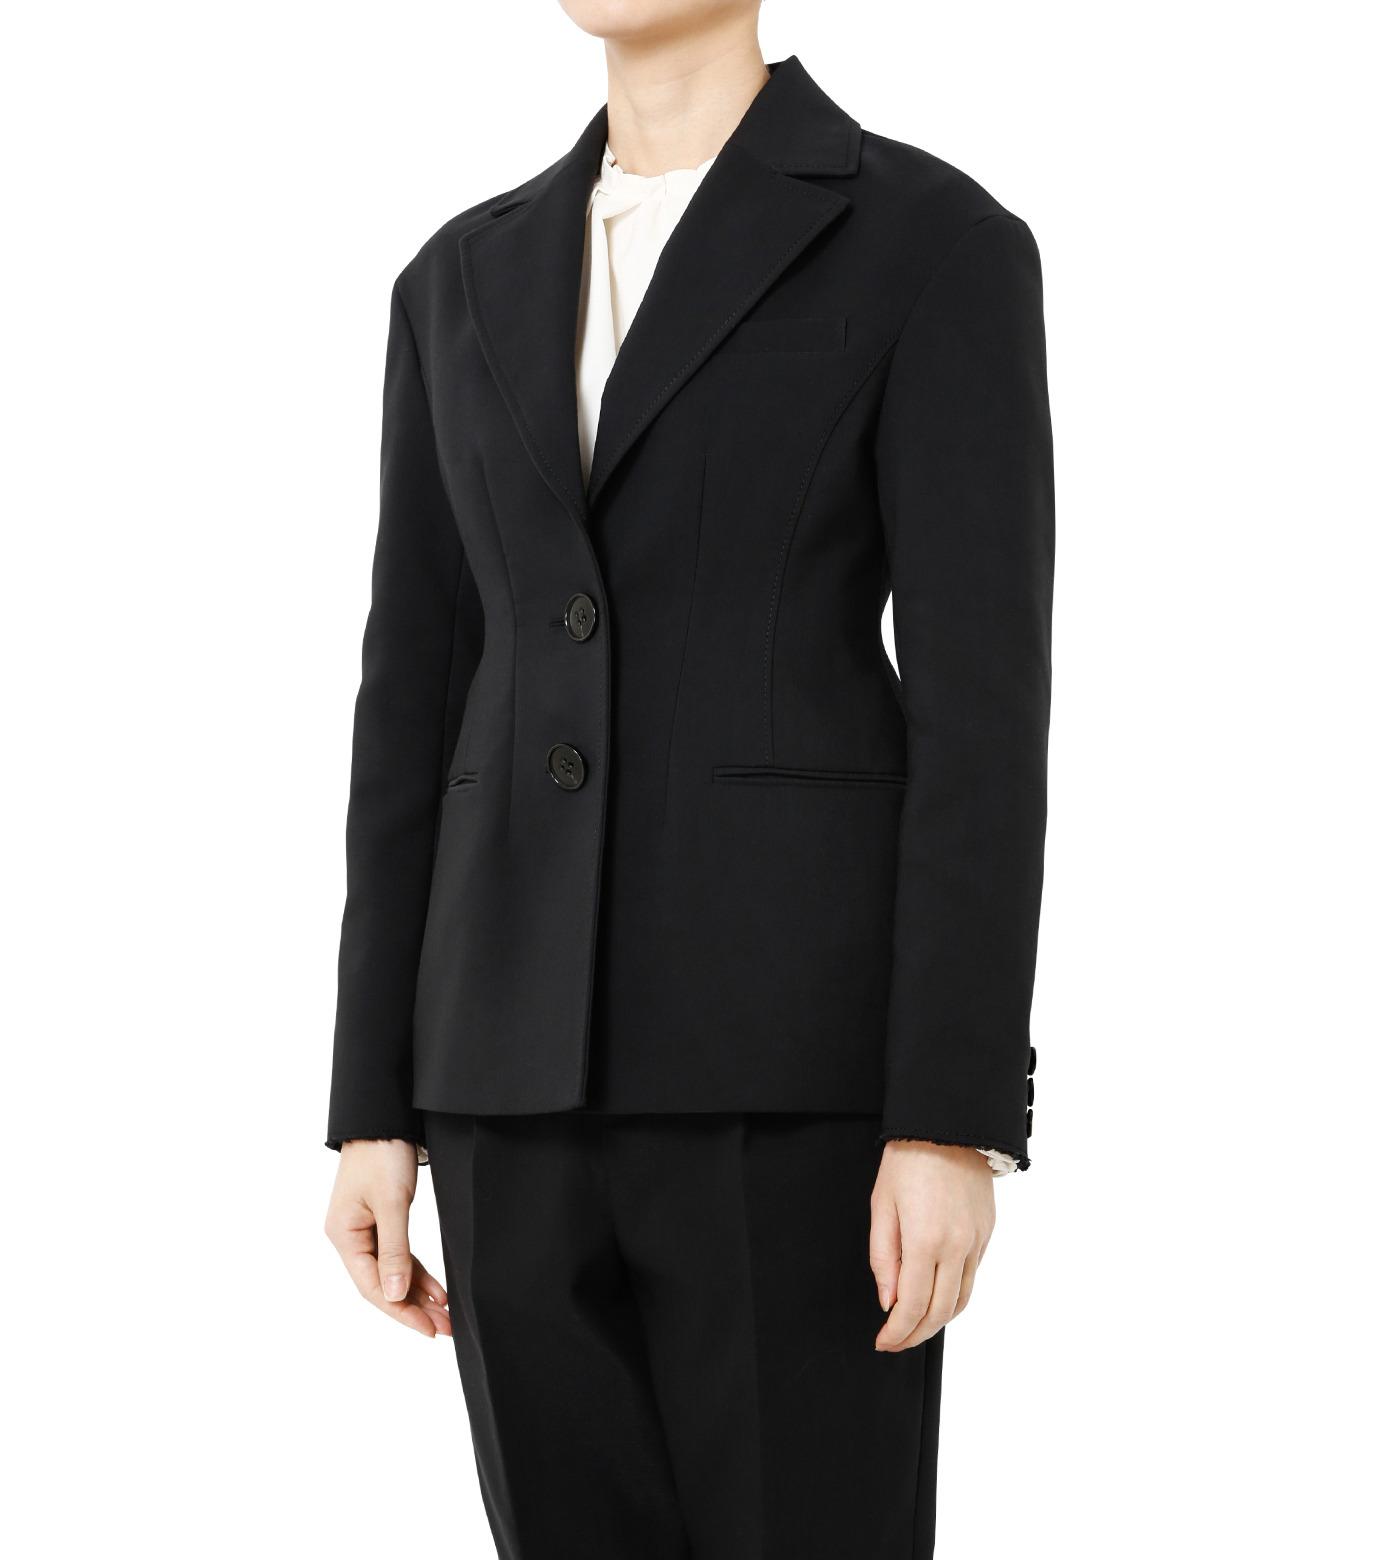 LE CIEL BLEU(ルシェルブルー)のデフォルメラインテーラージャケット-BLACK(ジャケット/jacket)-19S64103 拡大詳細画像3